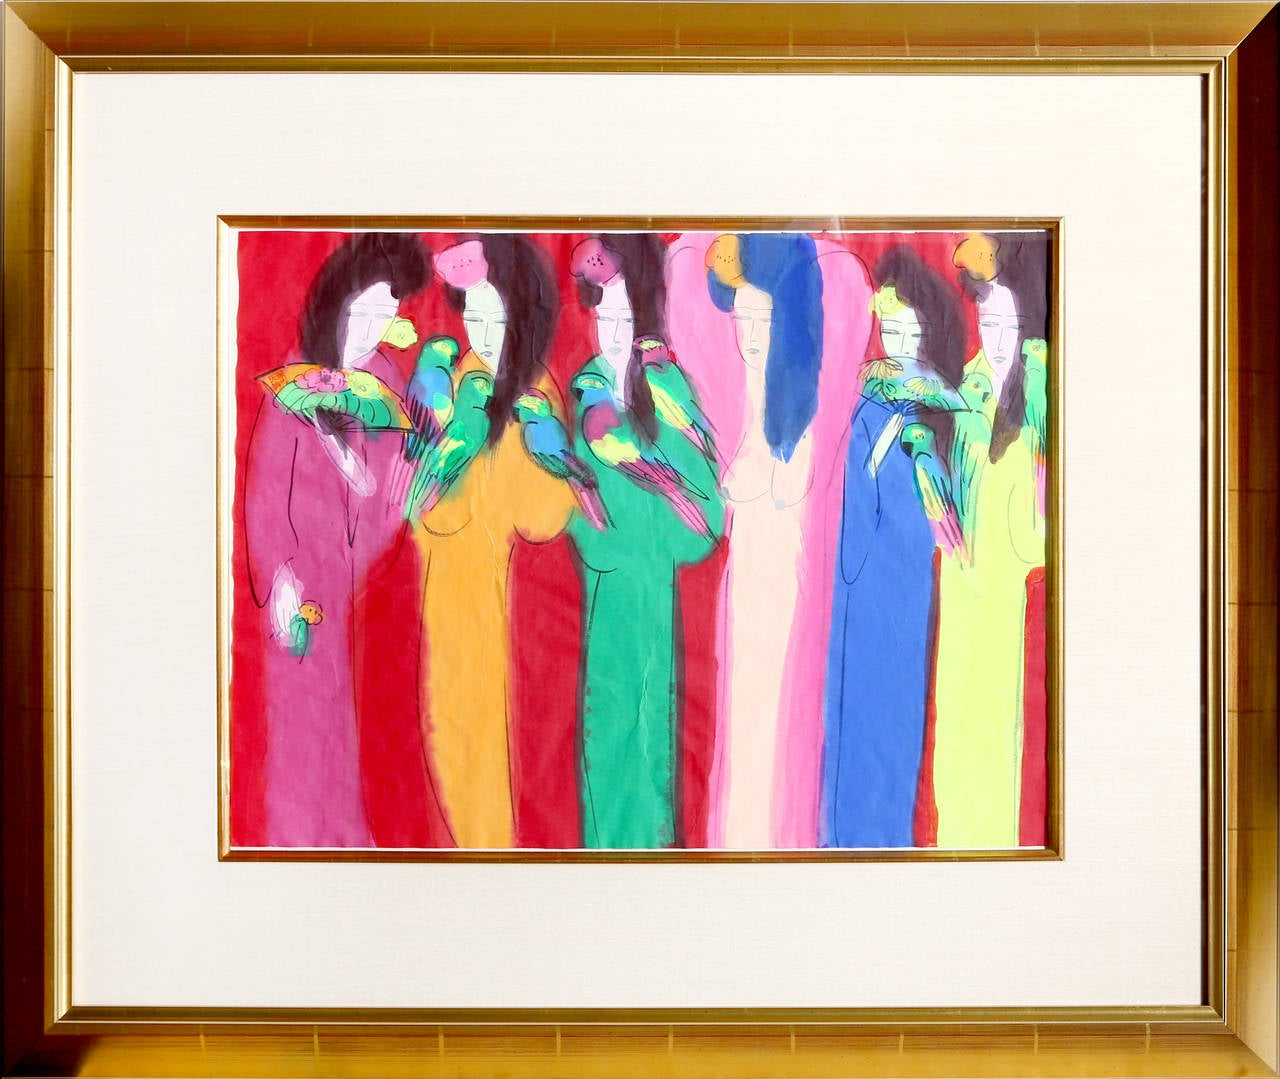 Six Geishas - Art by Walasse Ting